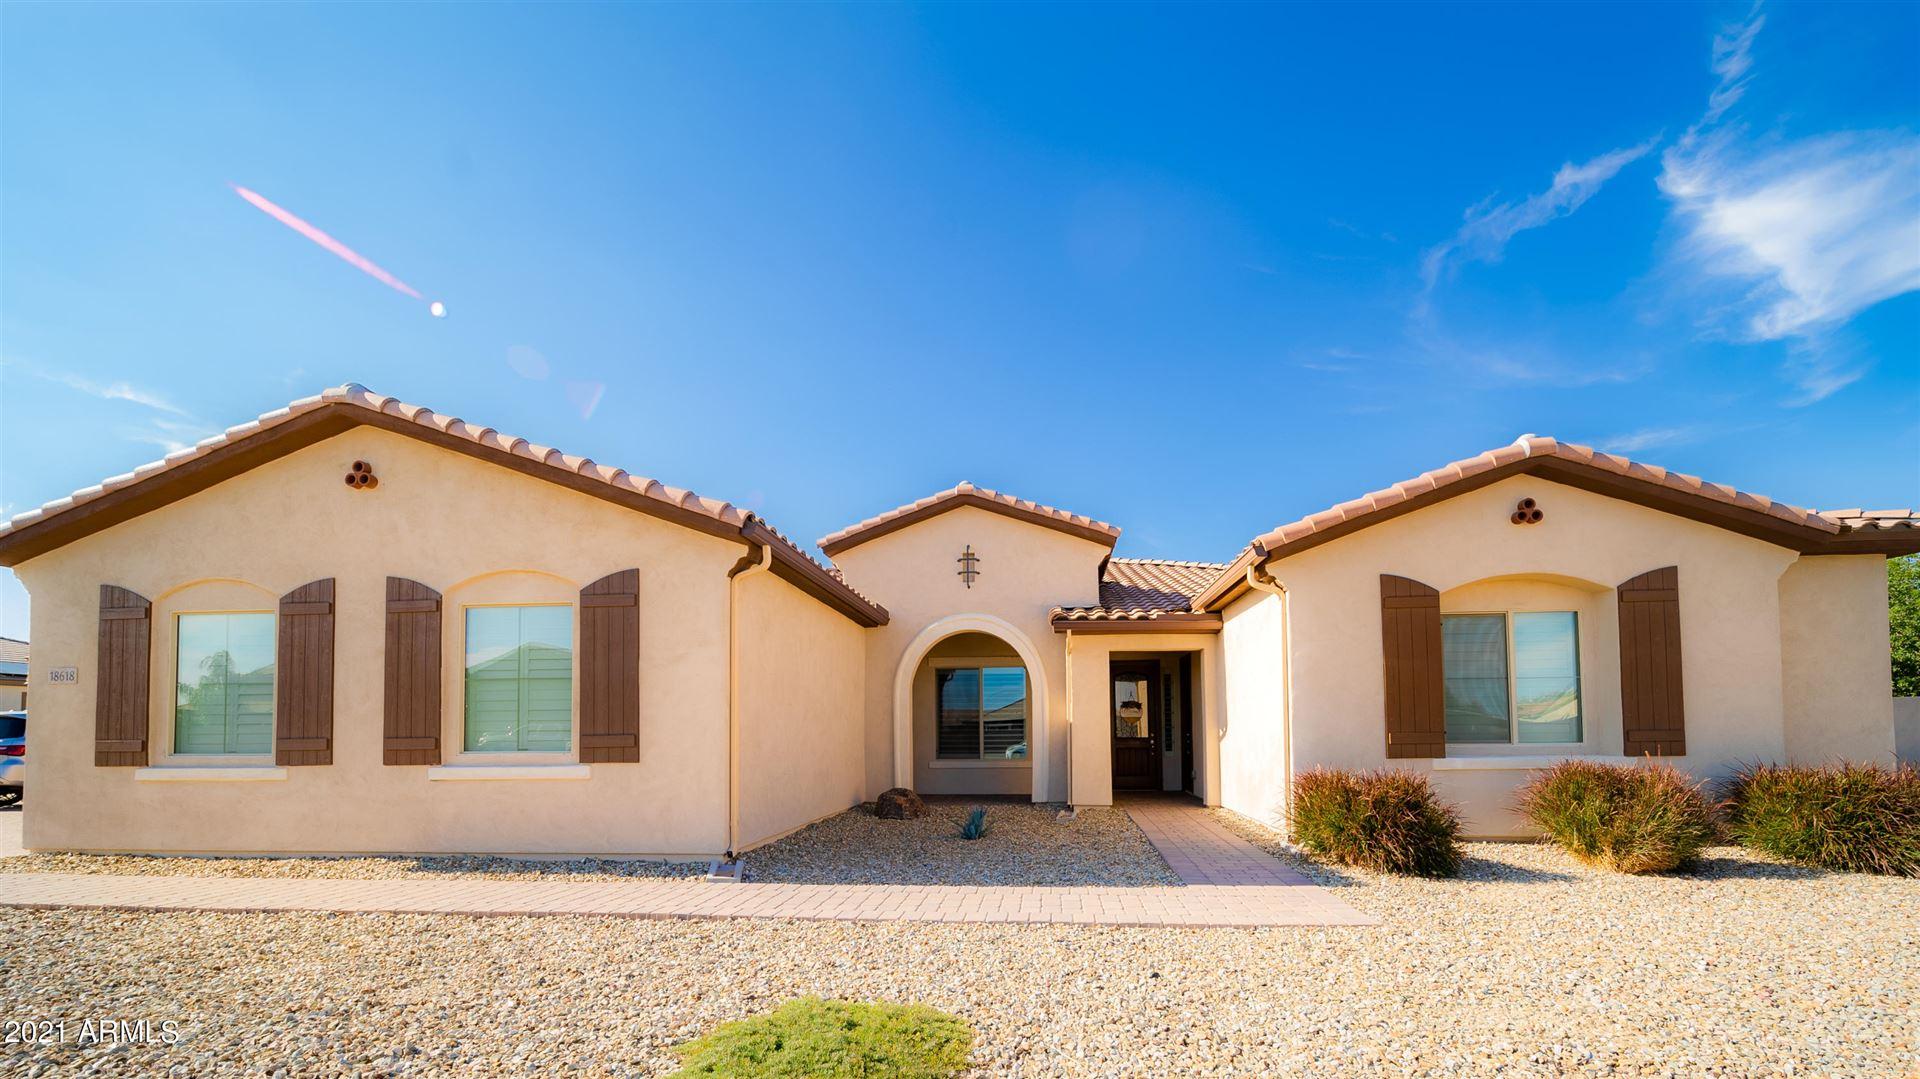 Photo of 18618 W SOLANO Drive, Litchfield Park, AZ 85340 (MLS # 6272445)